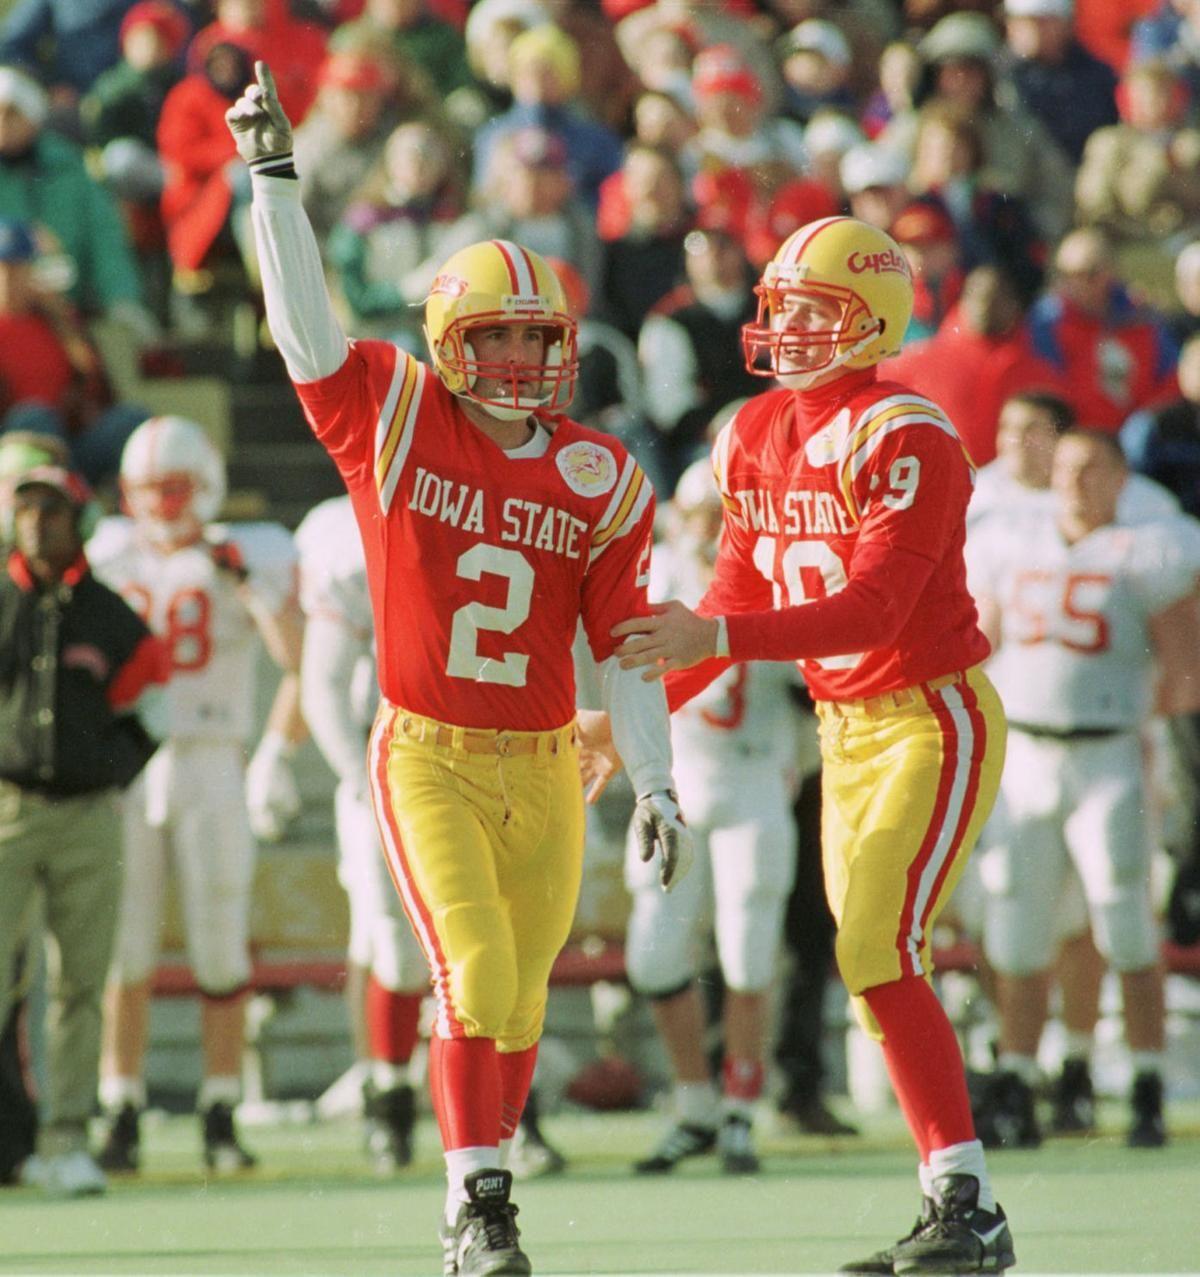 Iowa S State S Early 90s Uniforms College Football Football Iowa